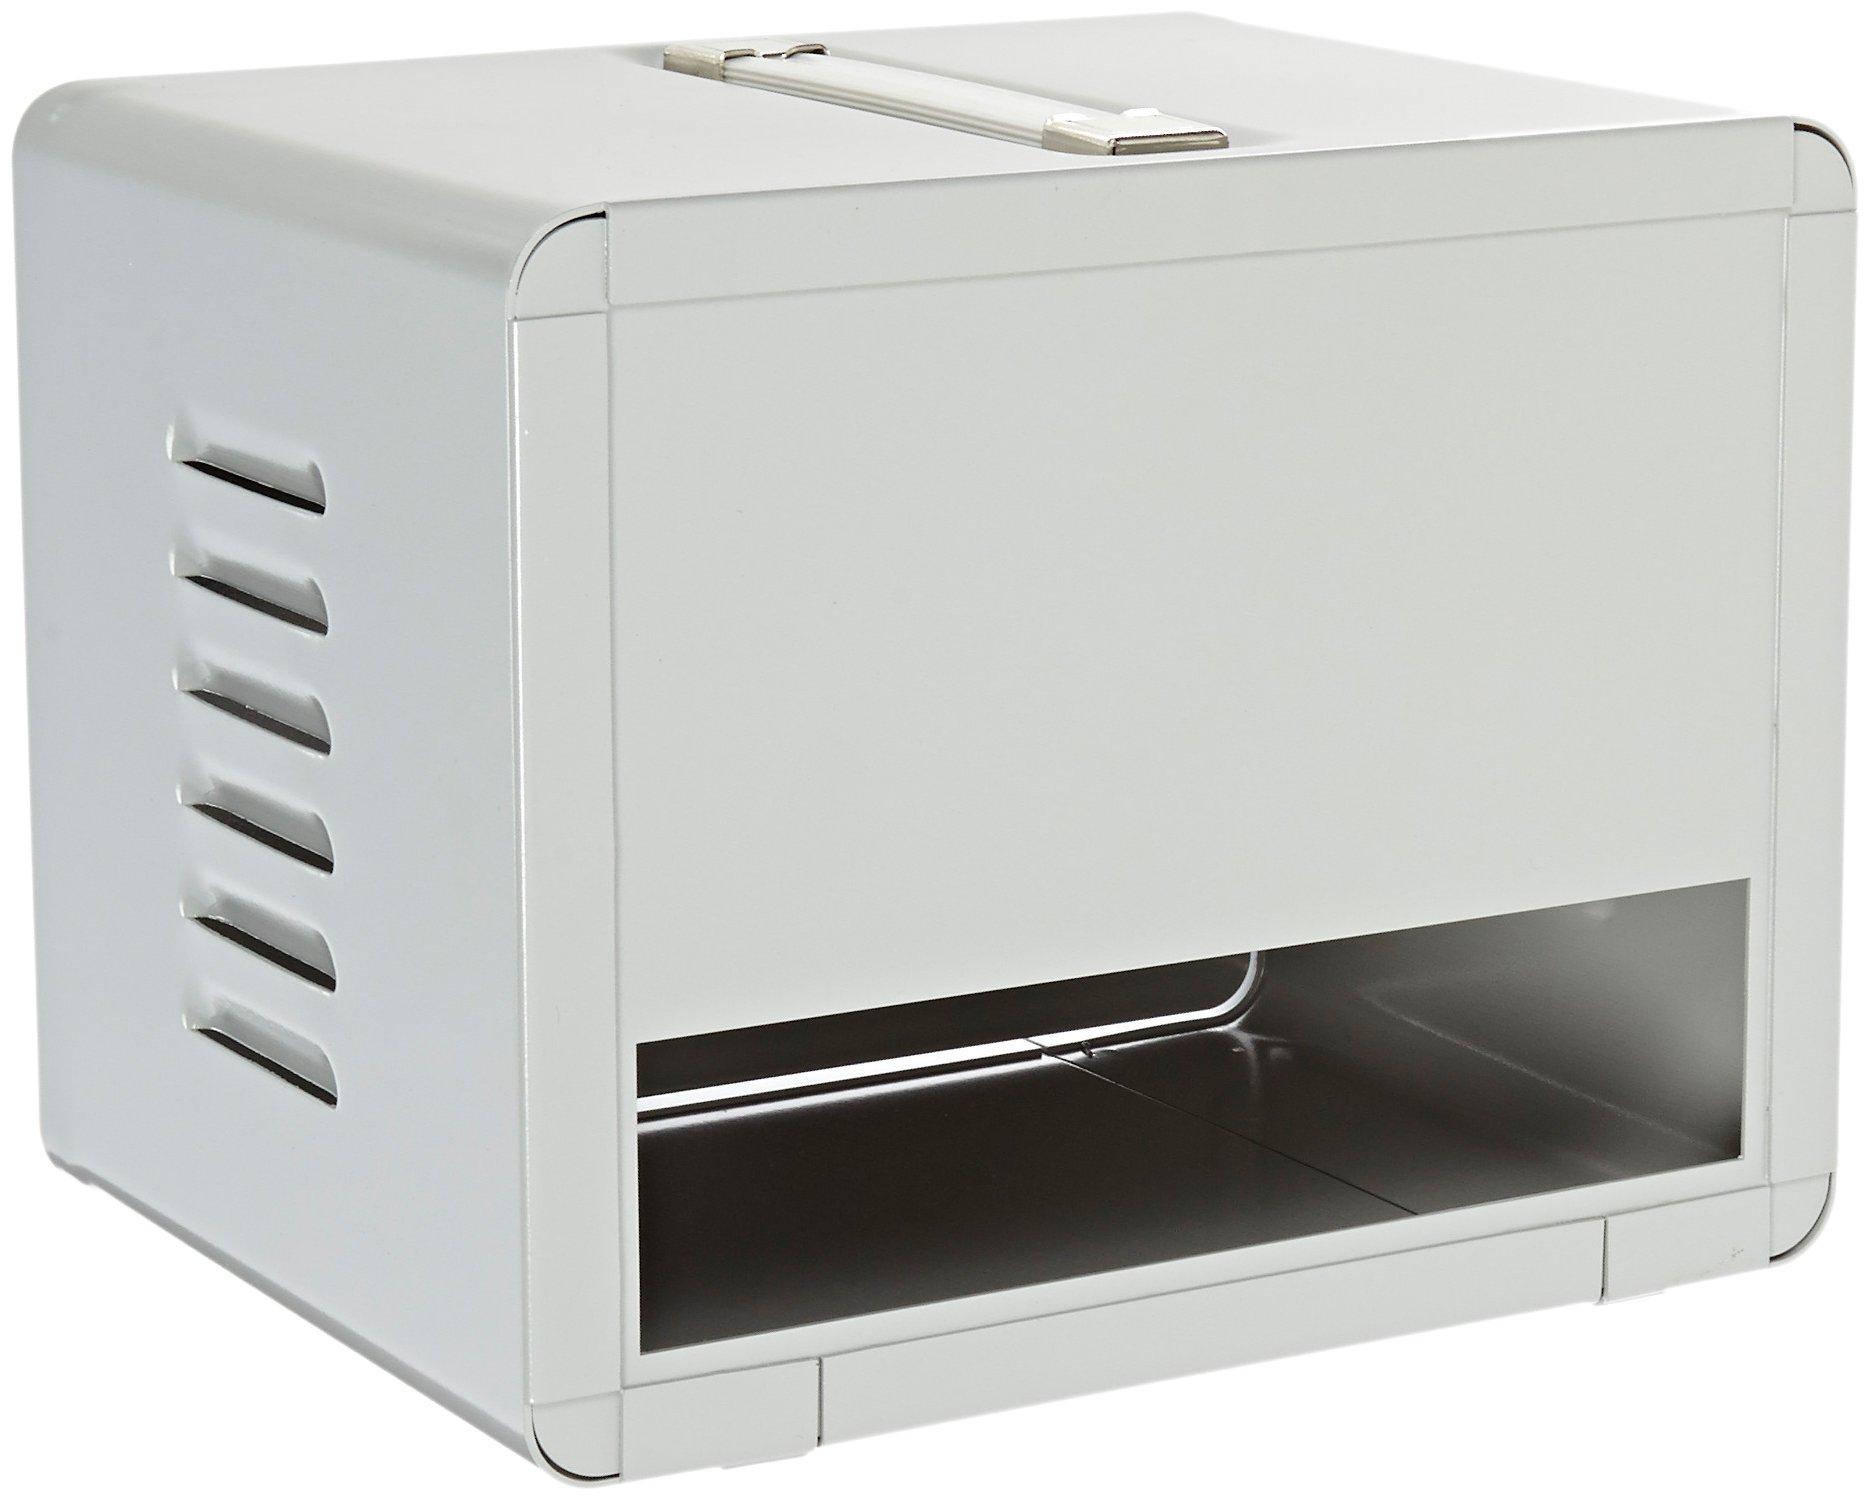 BUD Industries WA-1542 Aluminum Portacabs Small Metal Electronics Enclosure, 10-1/8'' Width x 8'' Height x 8'' Depth, Metallic Gray Finish